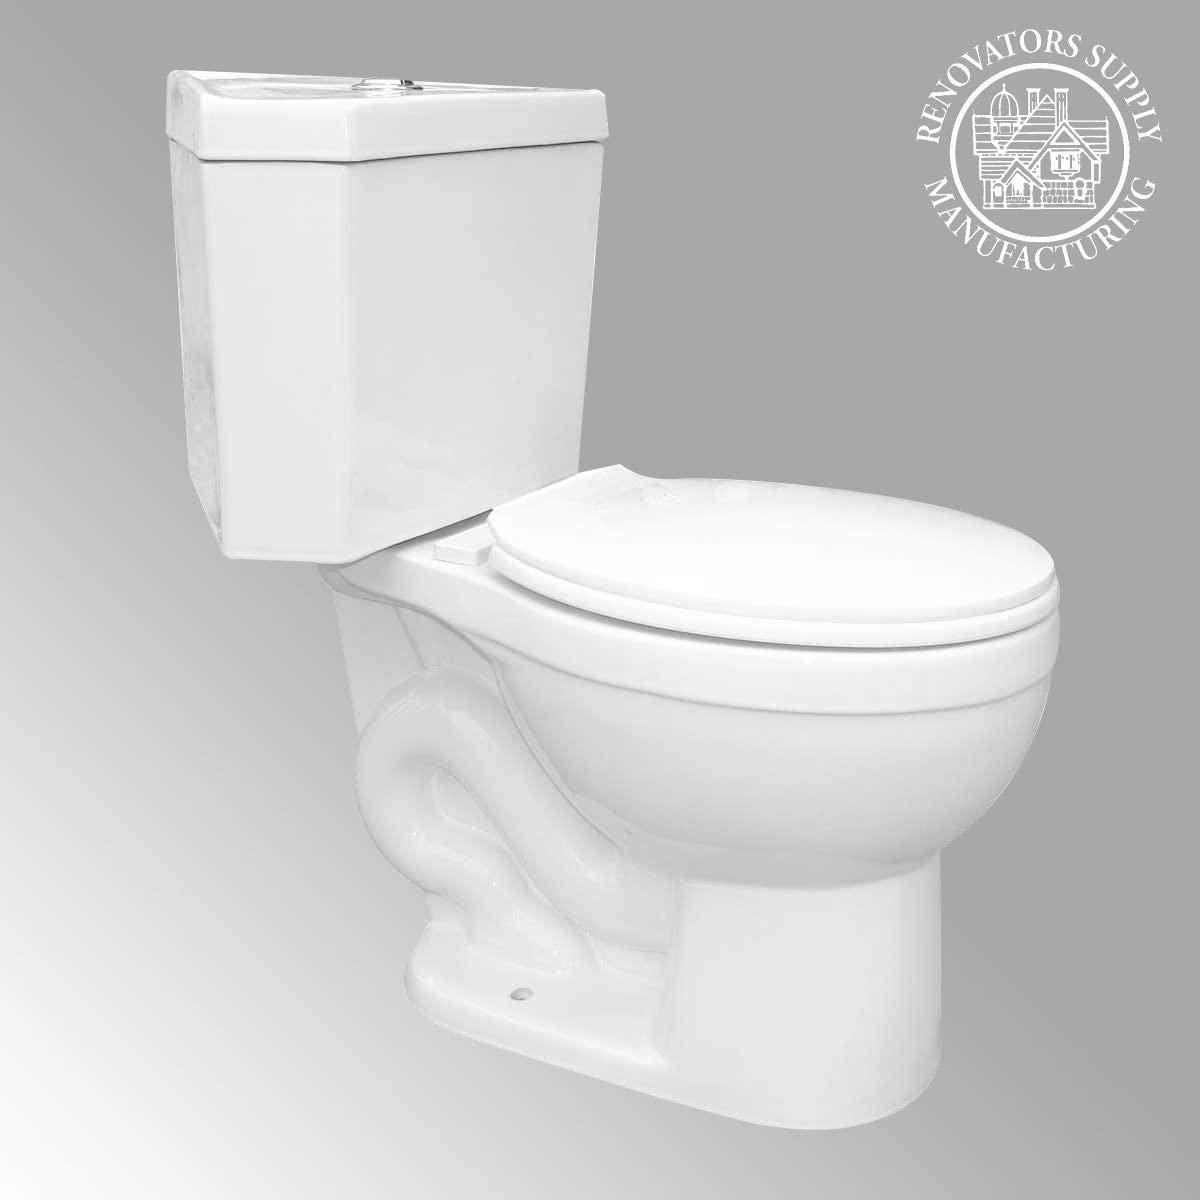 Troyt Corner 2-Piece Round Bathroom Toilet 0.8/1.6 GPF Hi Low Button Flush WATERSENSE Heavy Duty Porcelain Includes Slow Close Toilet Seat Renovators Supply Manufacturing